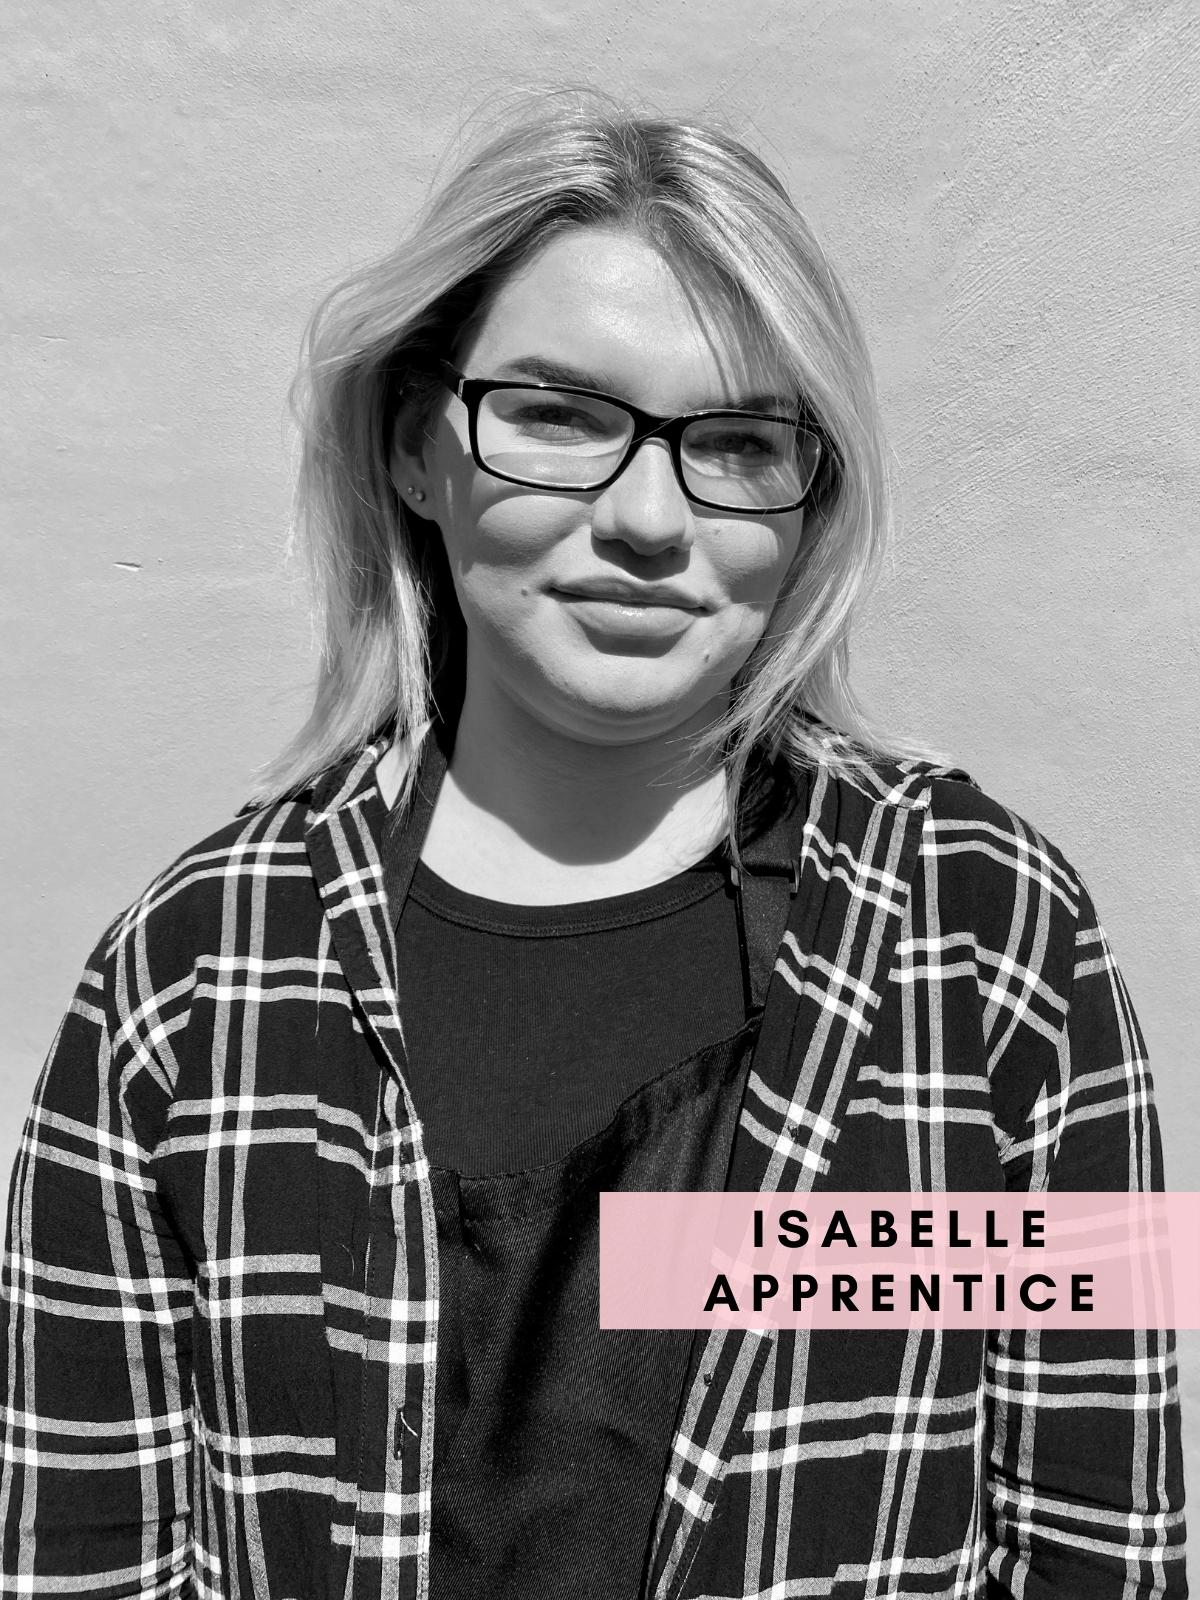 Isabelle – Apprentice